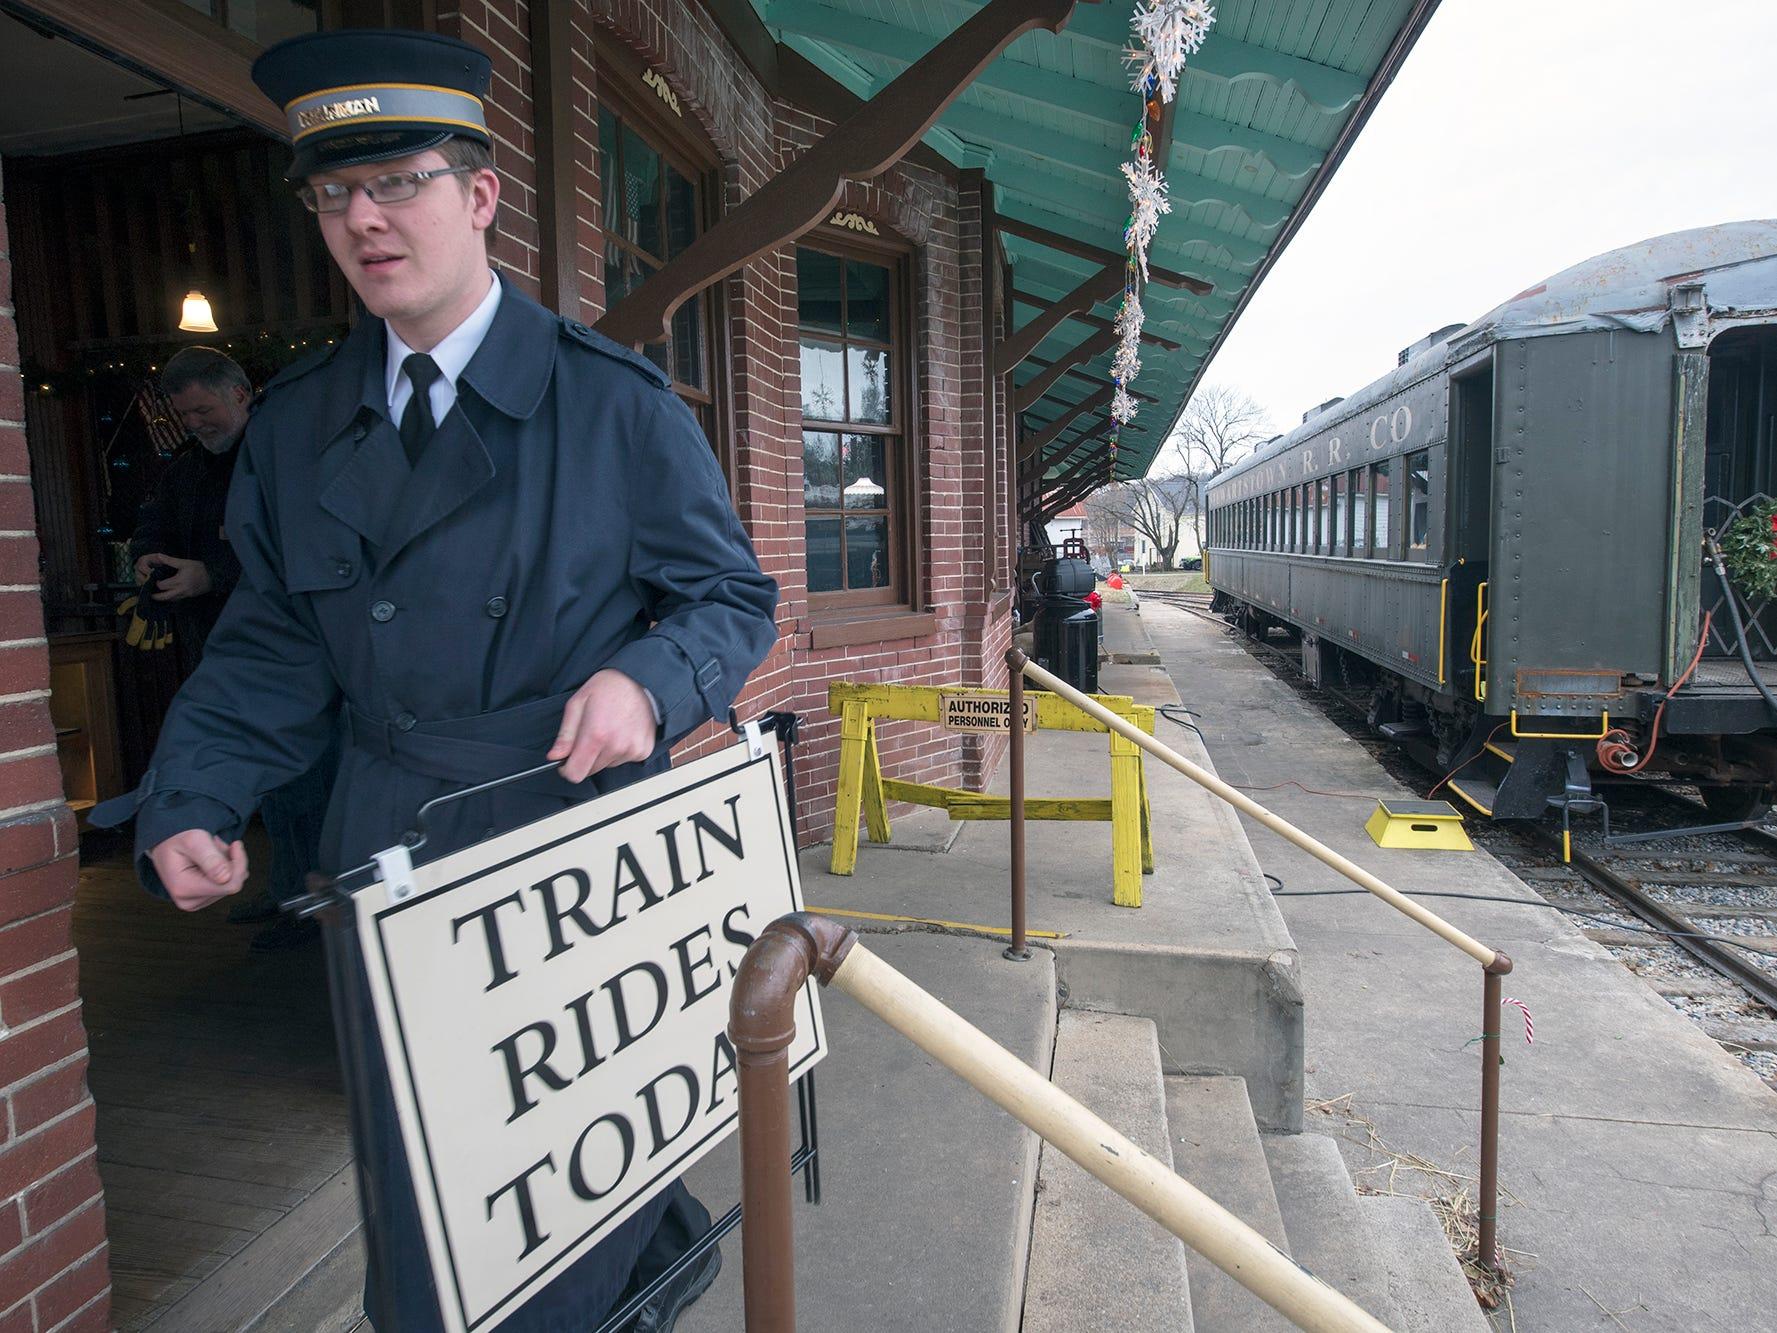 Photos: Junior Railroaders carry on Stewartstown Railroad 1885 history